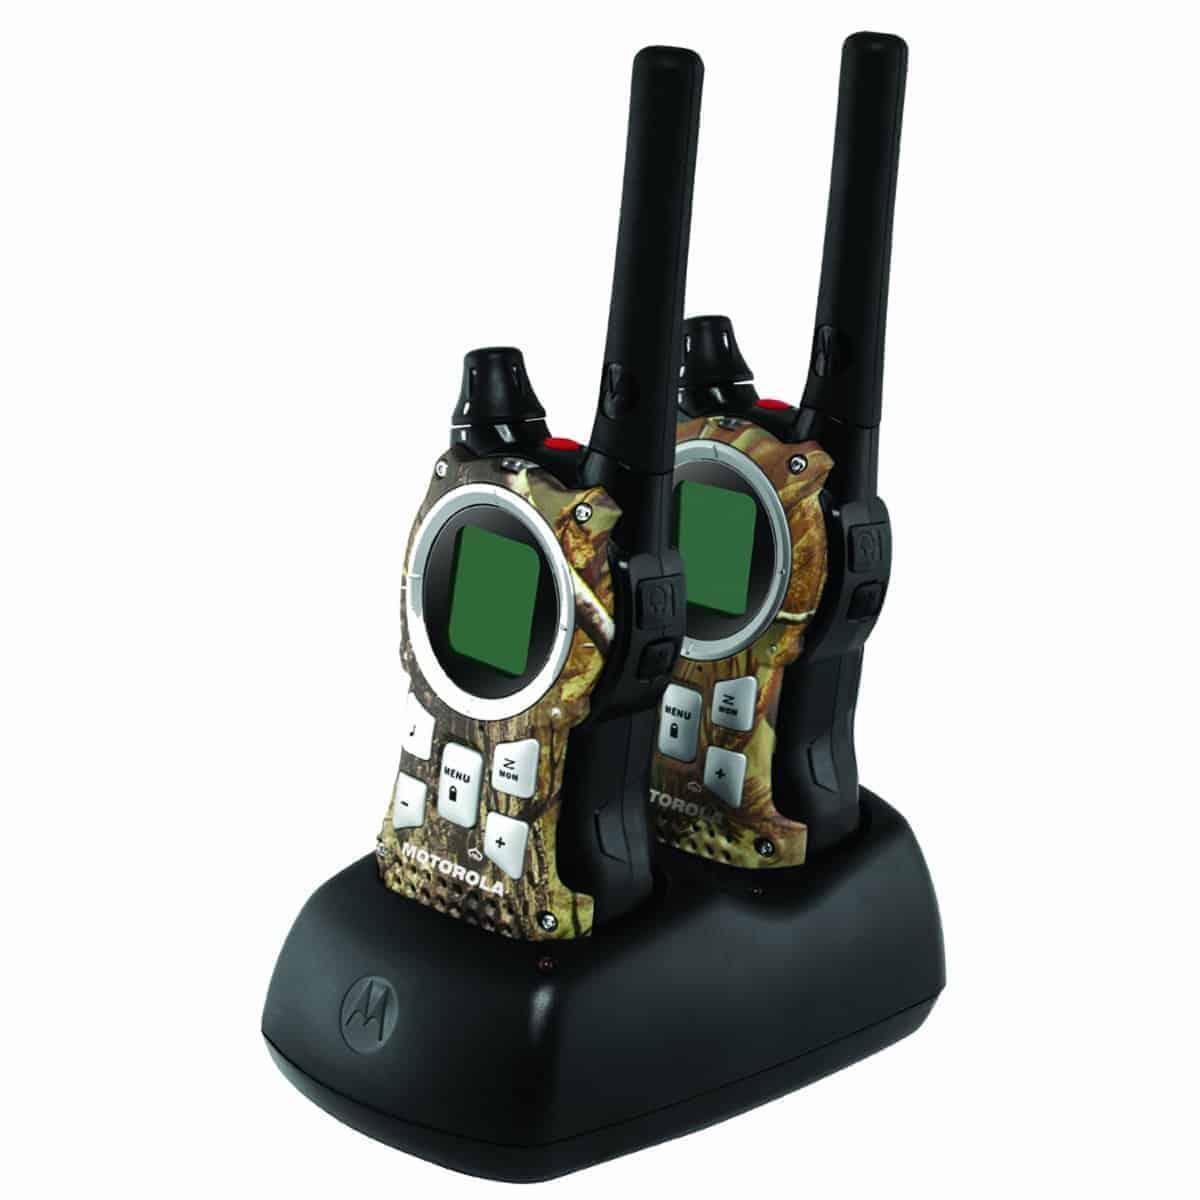 Motorola MR355R 35-Mile Range 22-Channel FRS/GMRS Two-Way Radio (Pair) -  Doomsday Prep